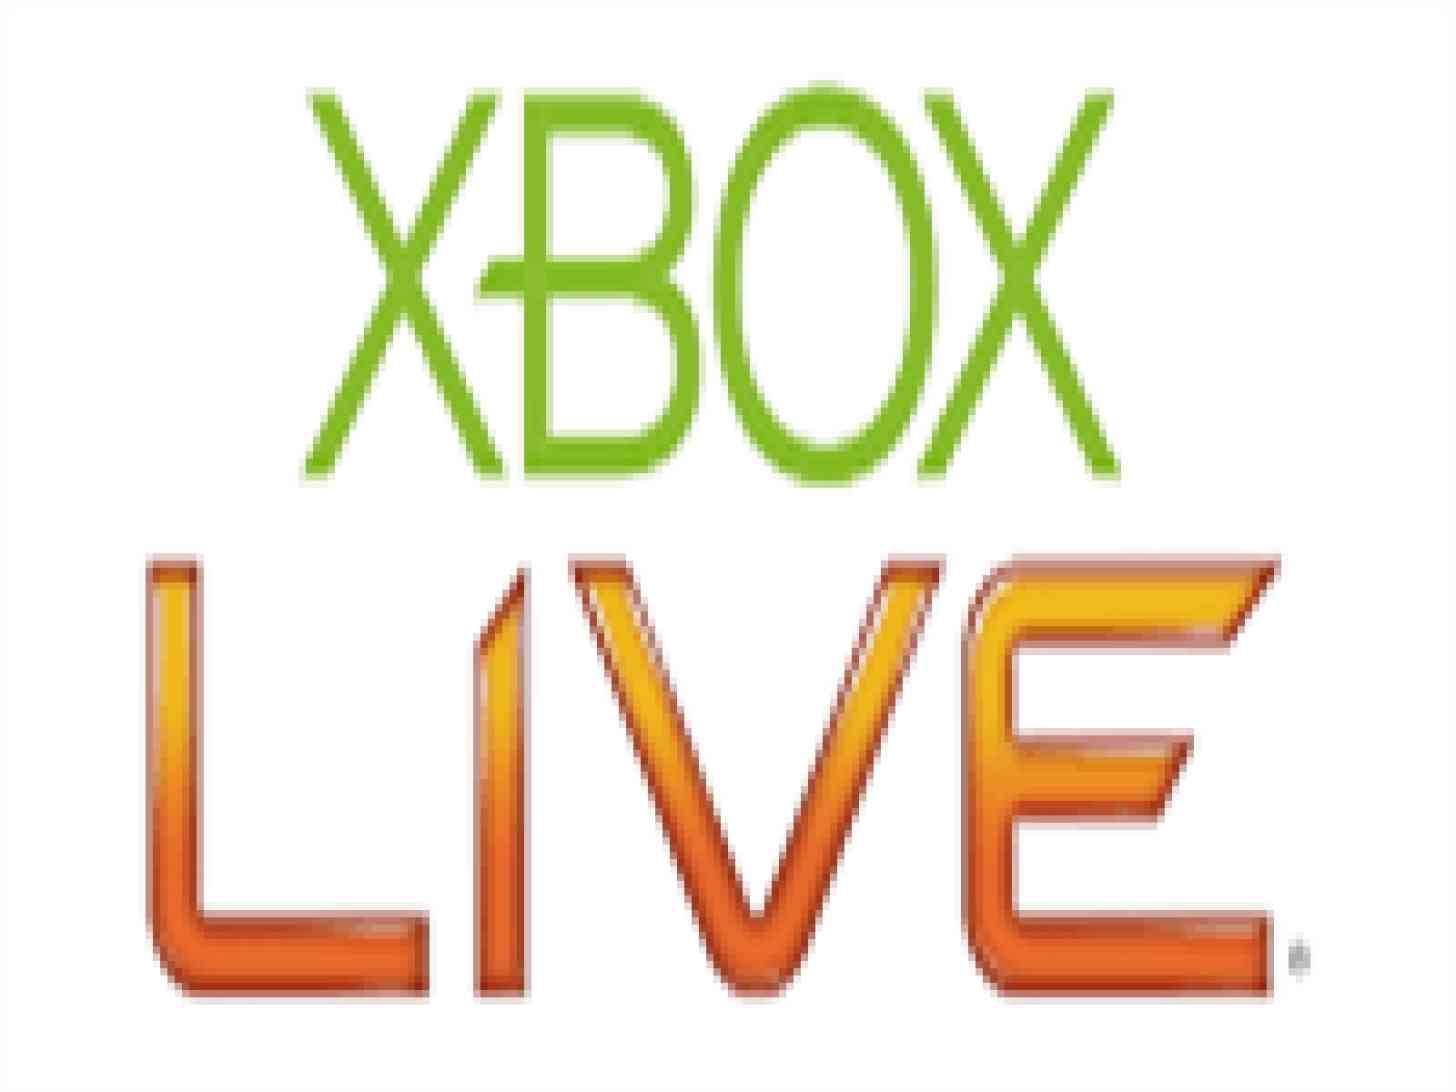 Windows Phone 8 needs a bigger focus on Xbox LIVE   PhoneDog